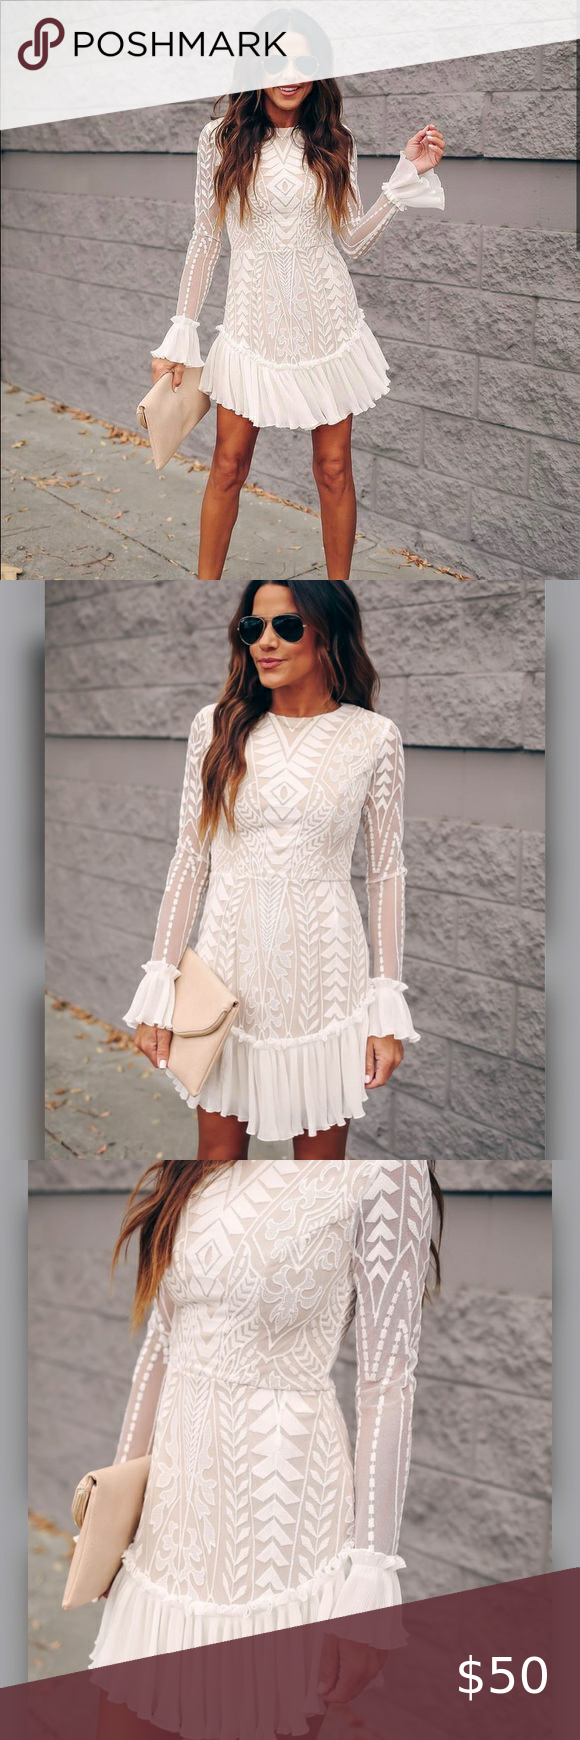 Nwts Vici Collection White Boho Lace Ruffle Dress Lace Ruffle Dress Boho Lace Ruffle Dress [ 1740 x 580 Pixel ]